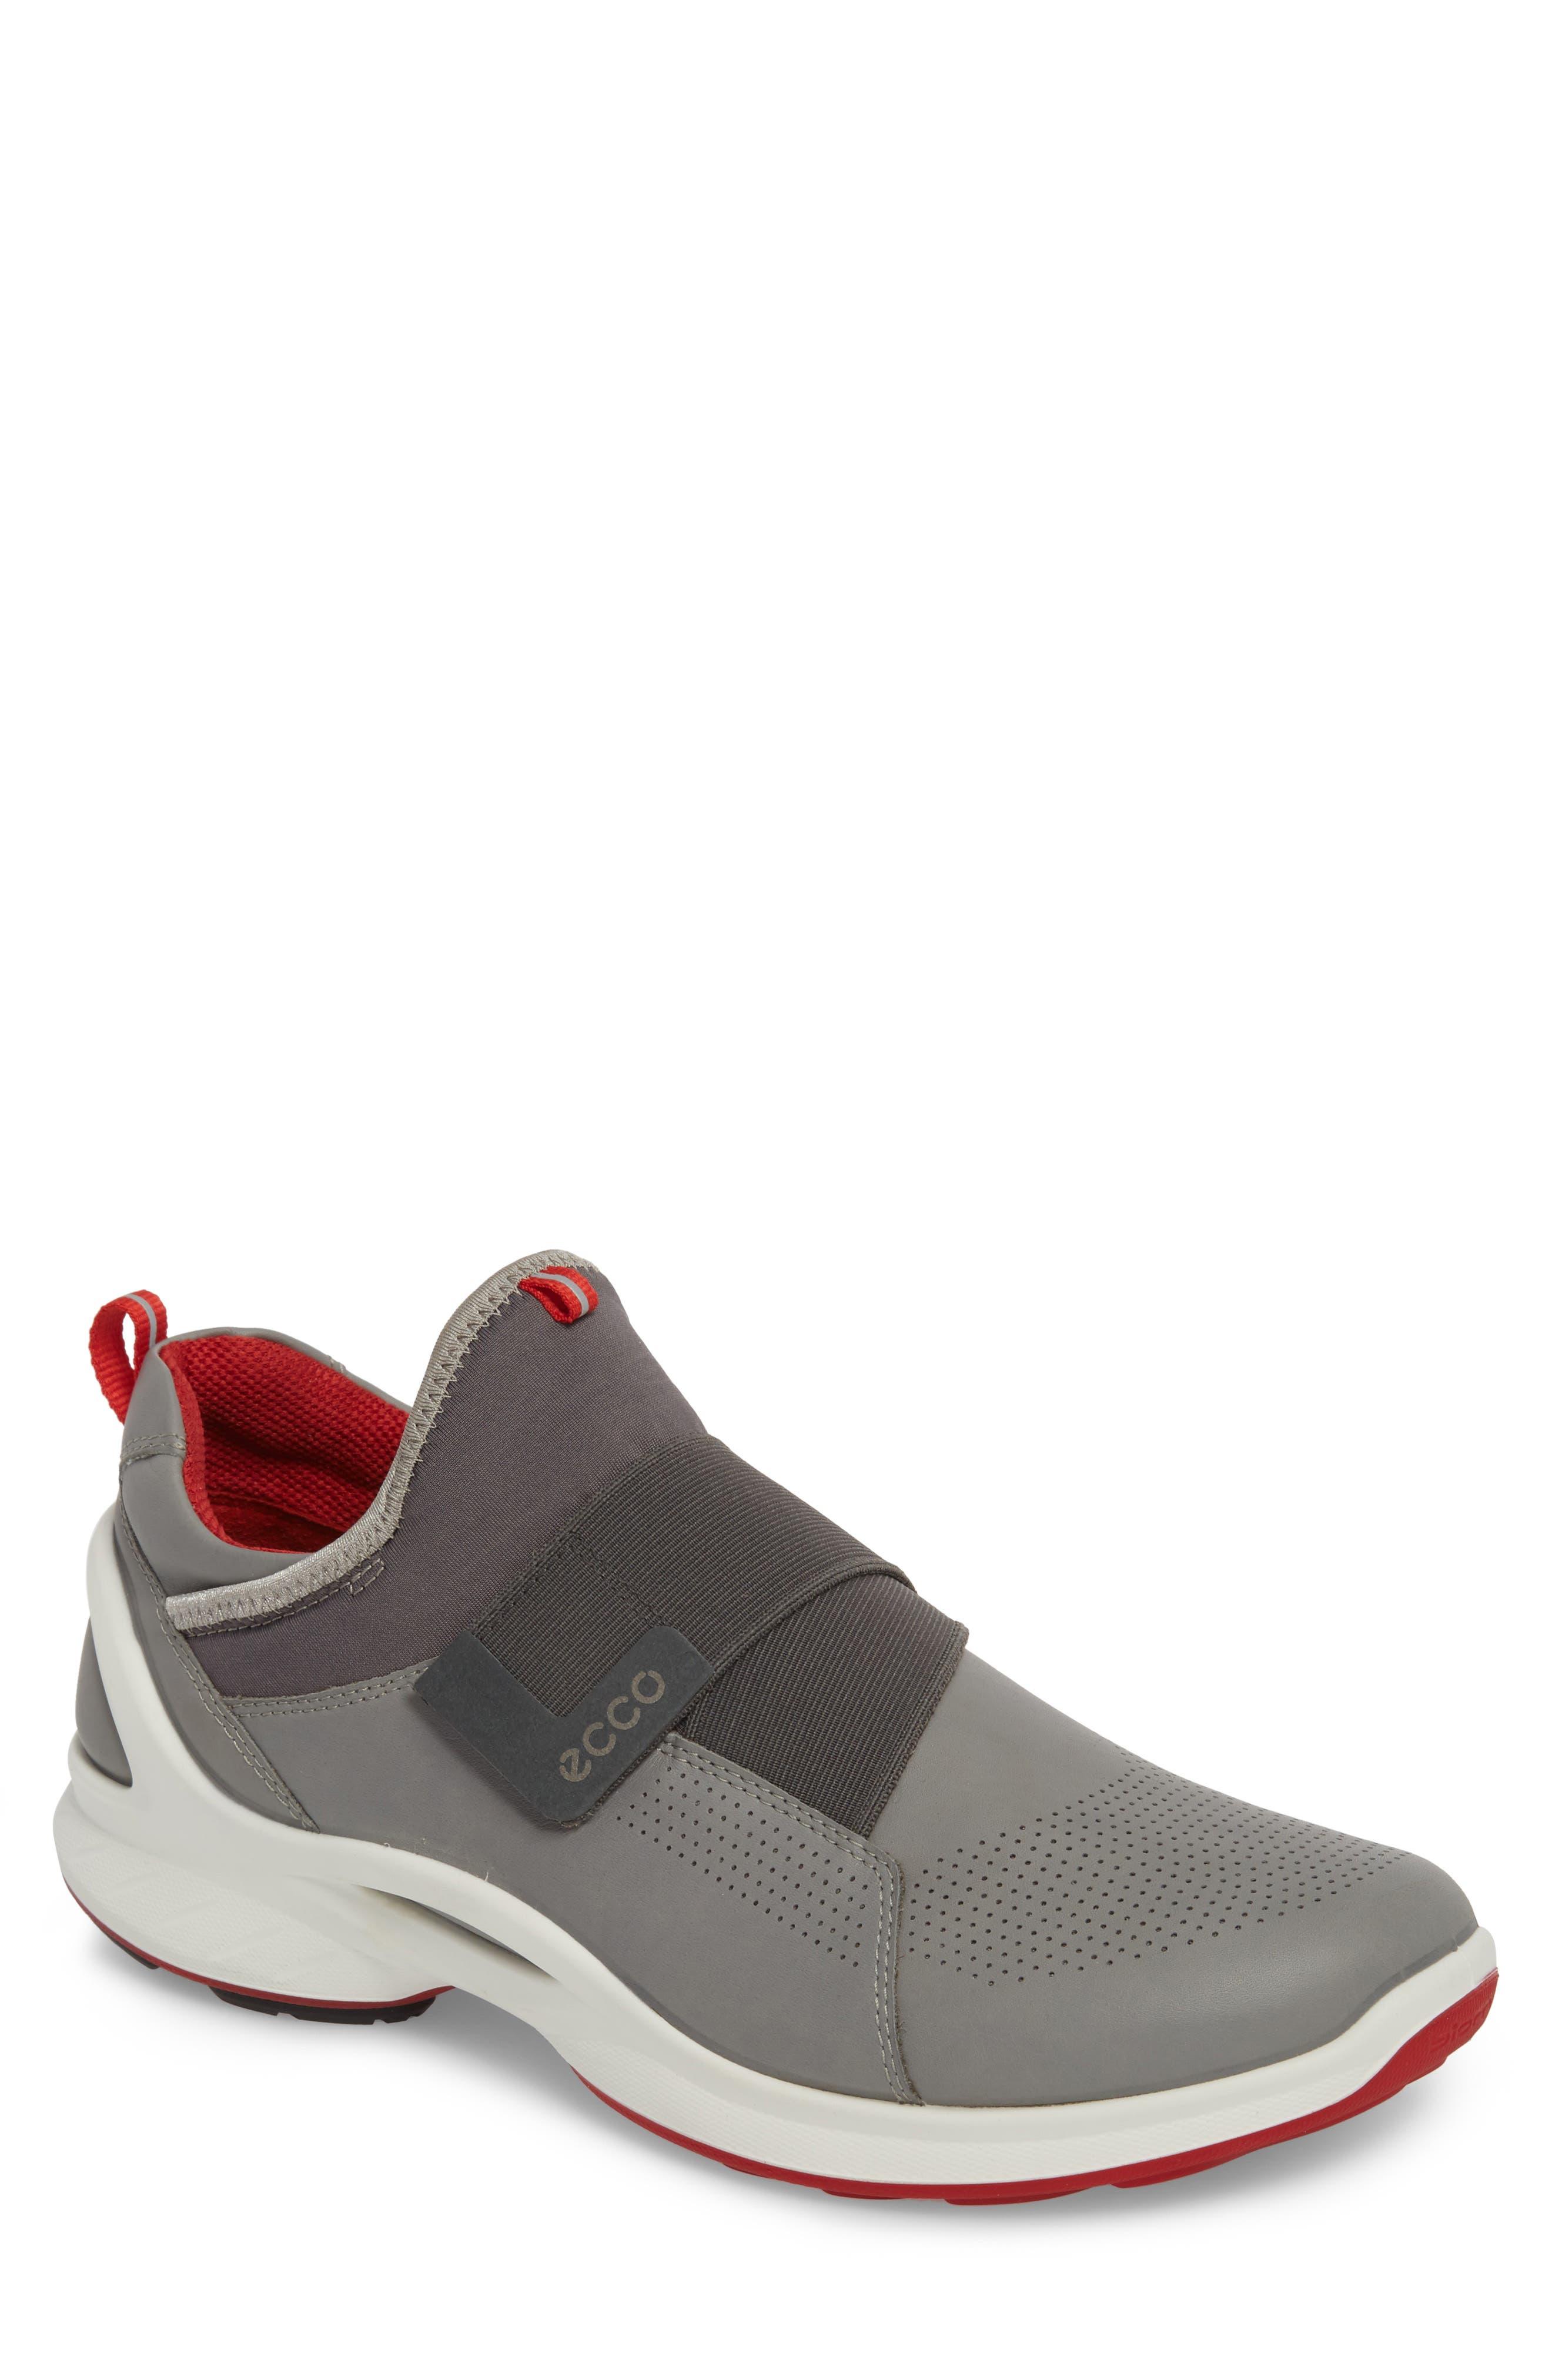 BIOM Fjuel Band Sneaker,                             Main thumbnail 1, color,                             Dark Shadow/ Titanium Leather